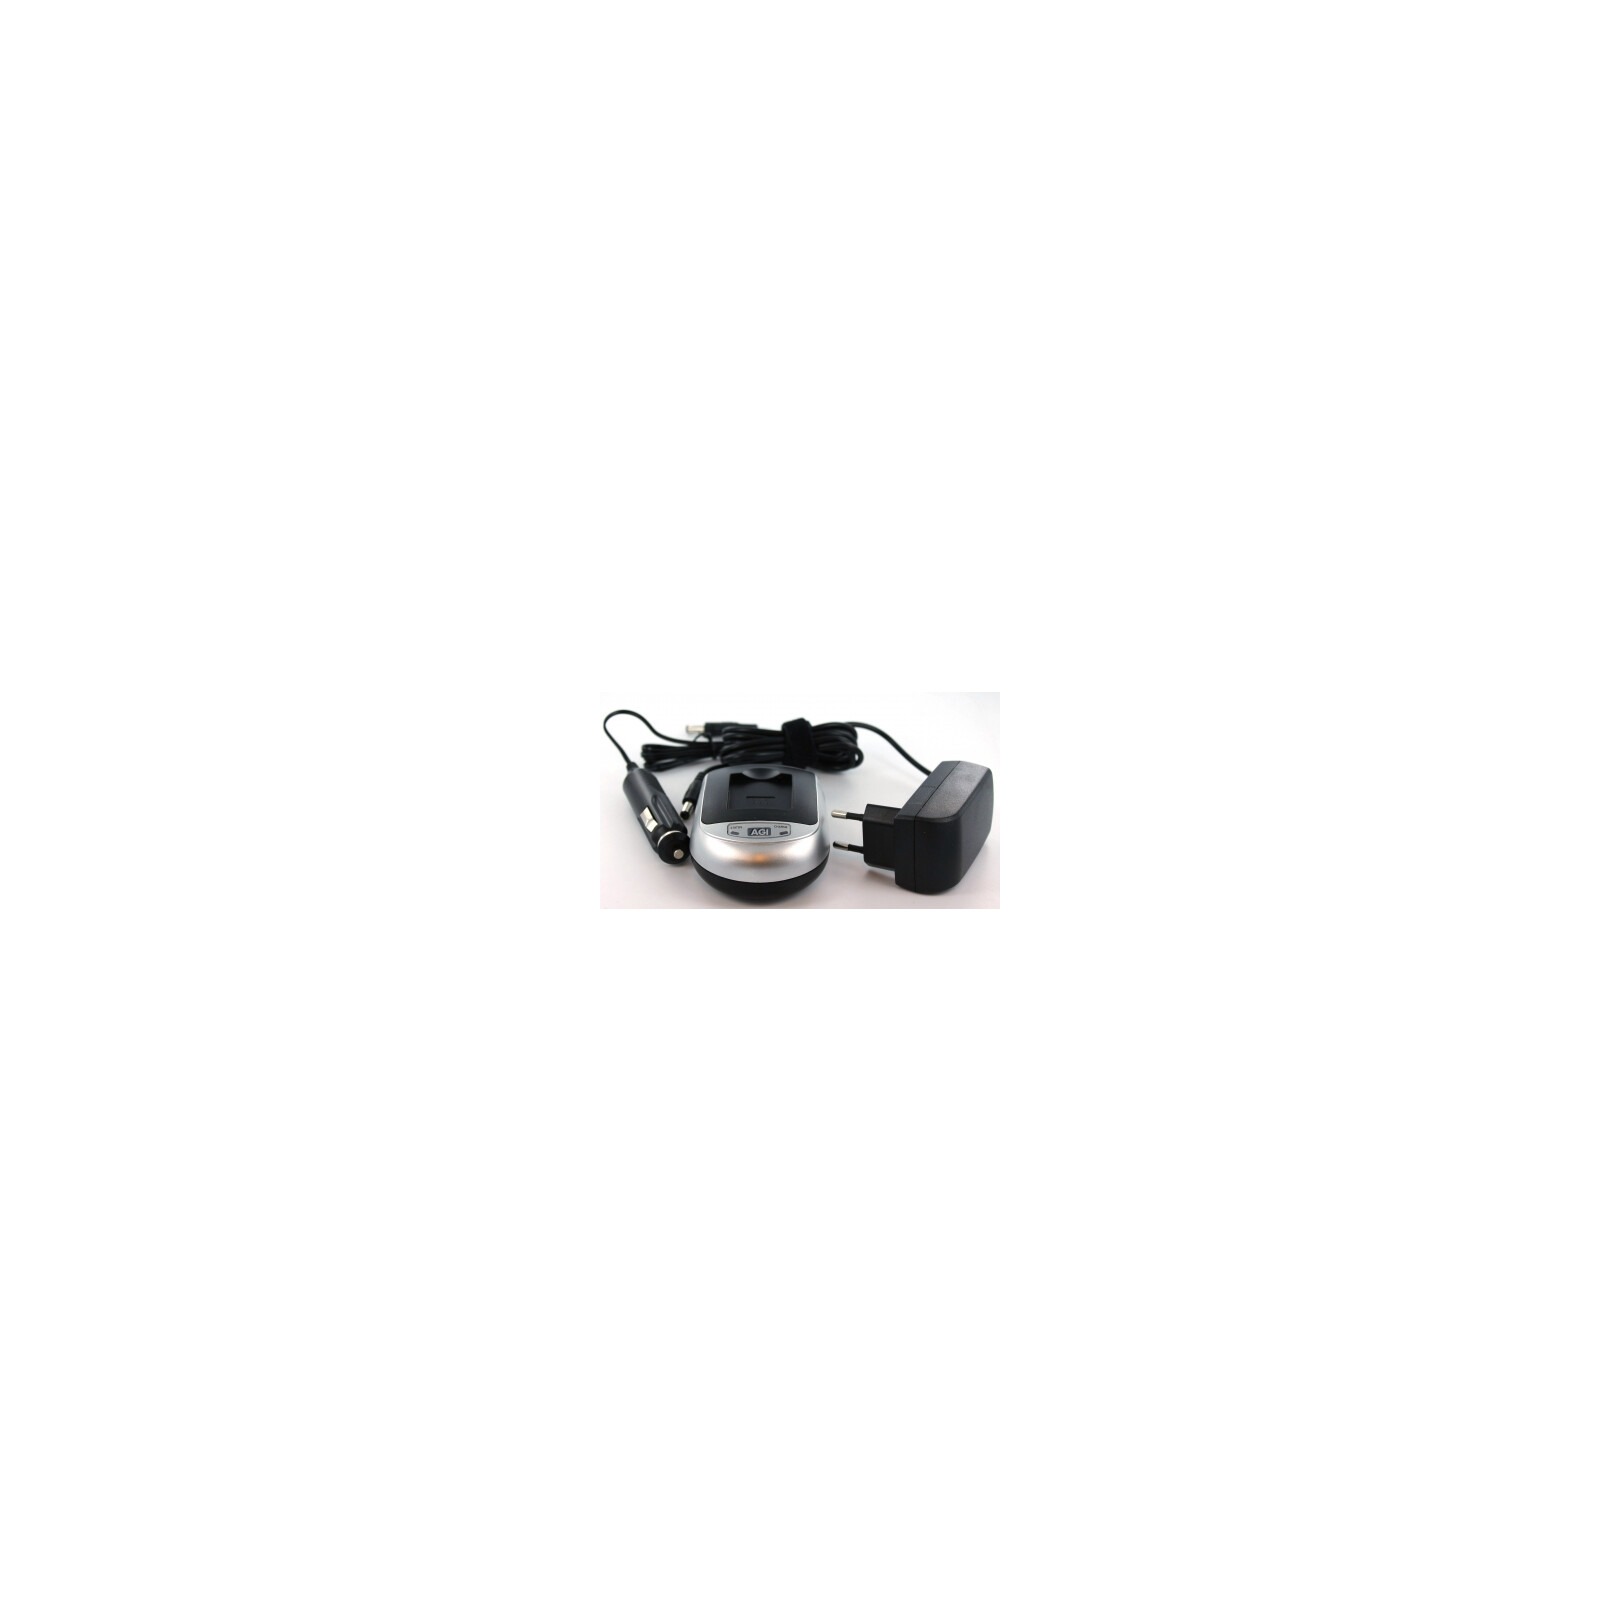 AGI Ladegerät Nikon Coolpix S2700